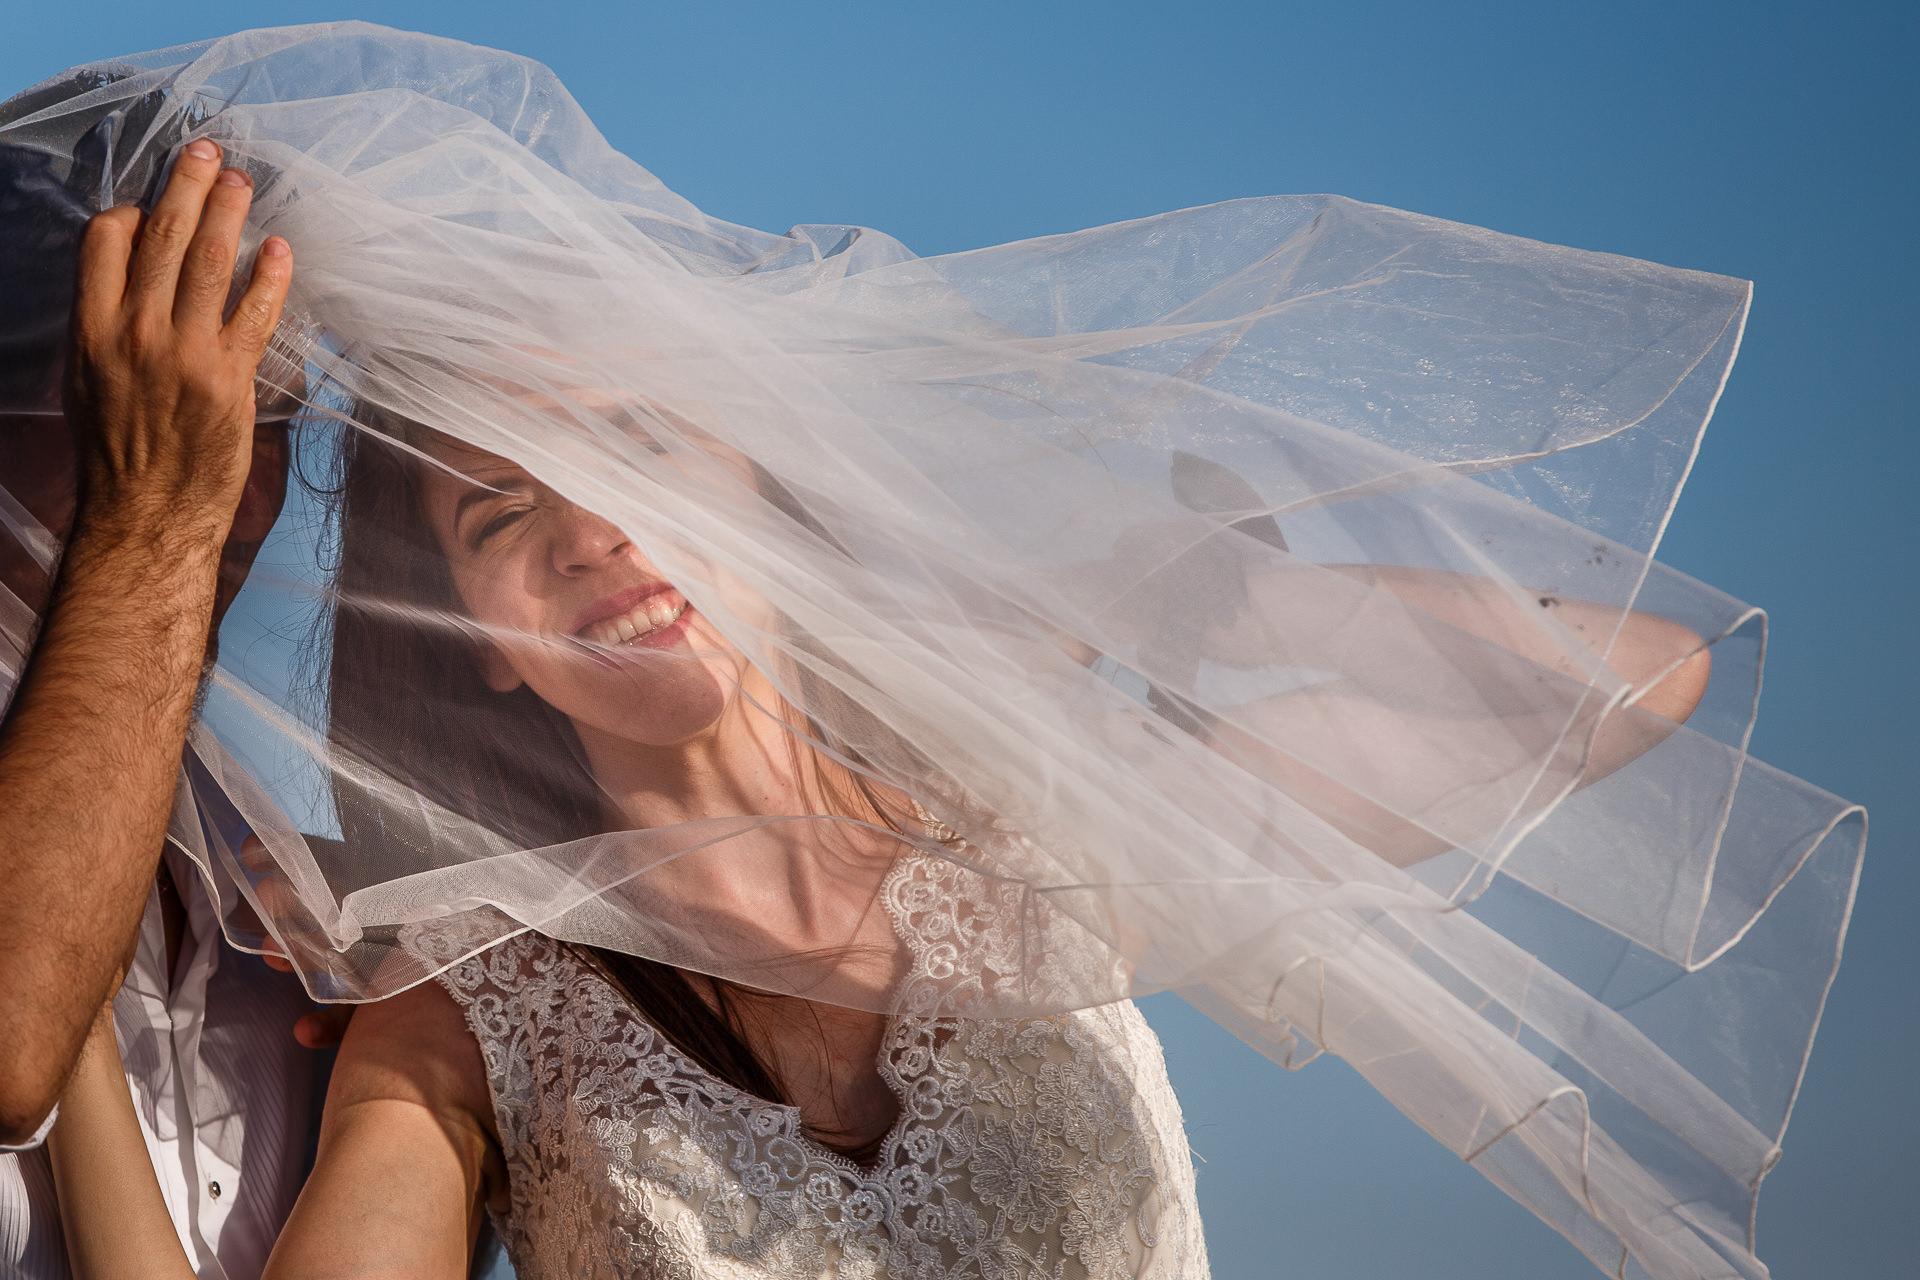 Şedinţă foto Trash The Dress - Vadu + Midia - Mihaela şi Alexandru - Mihai Zaharia Photography - 11